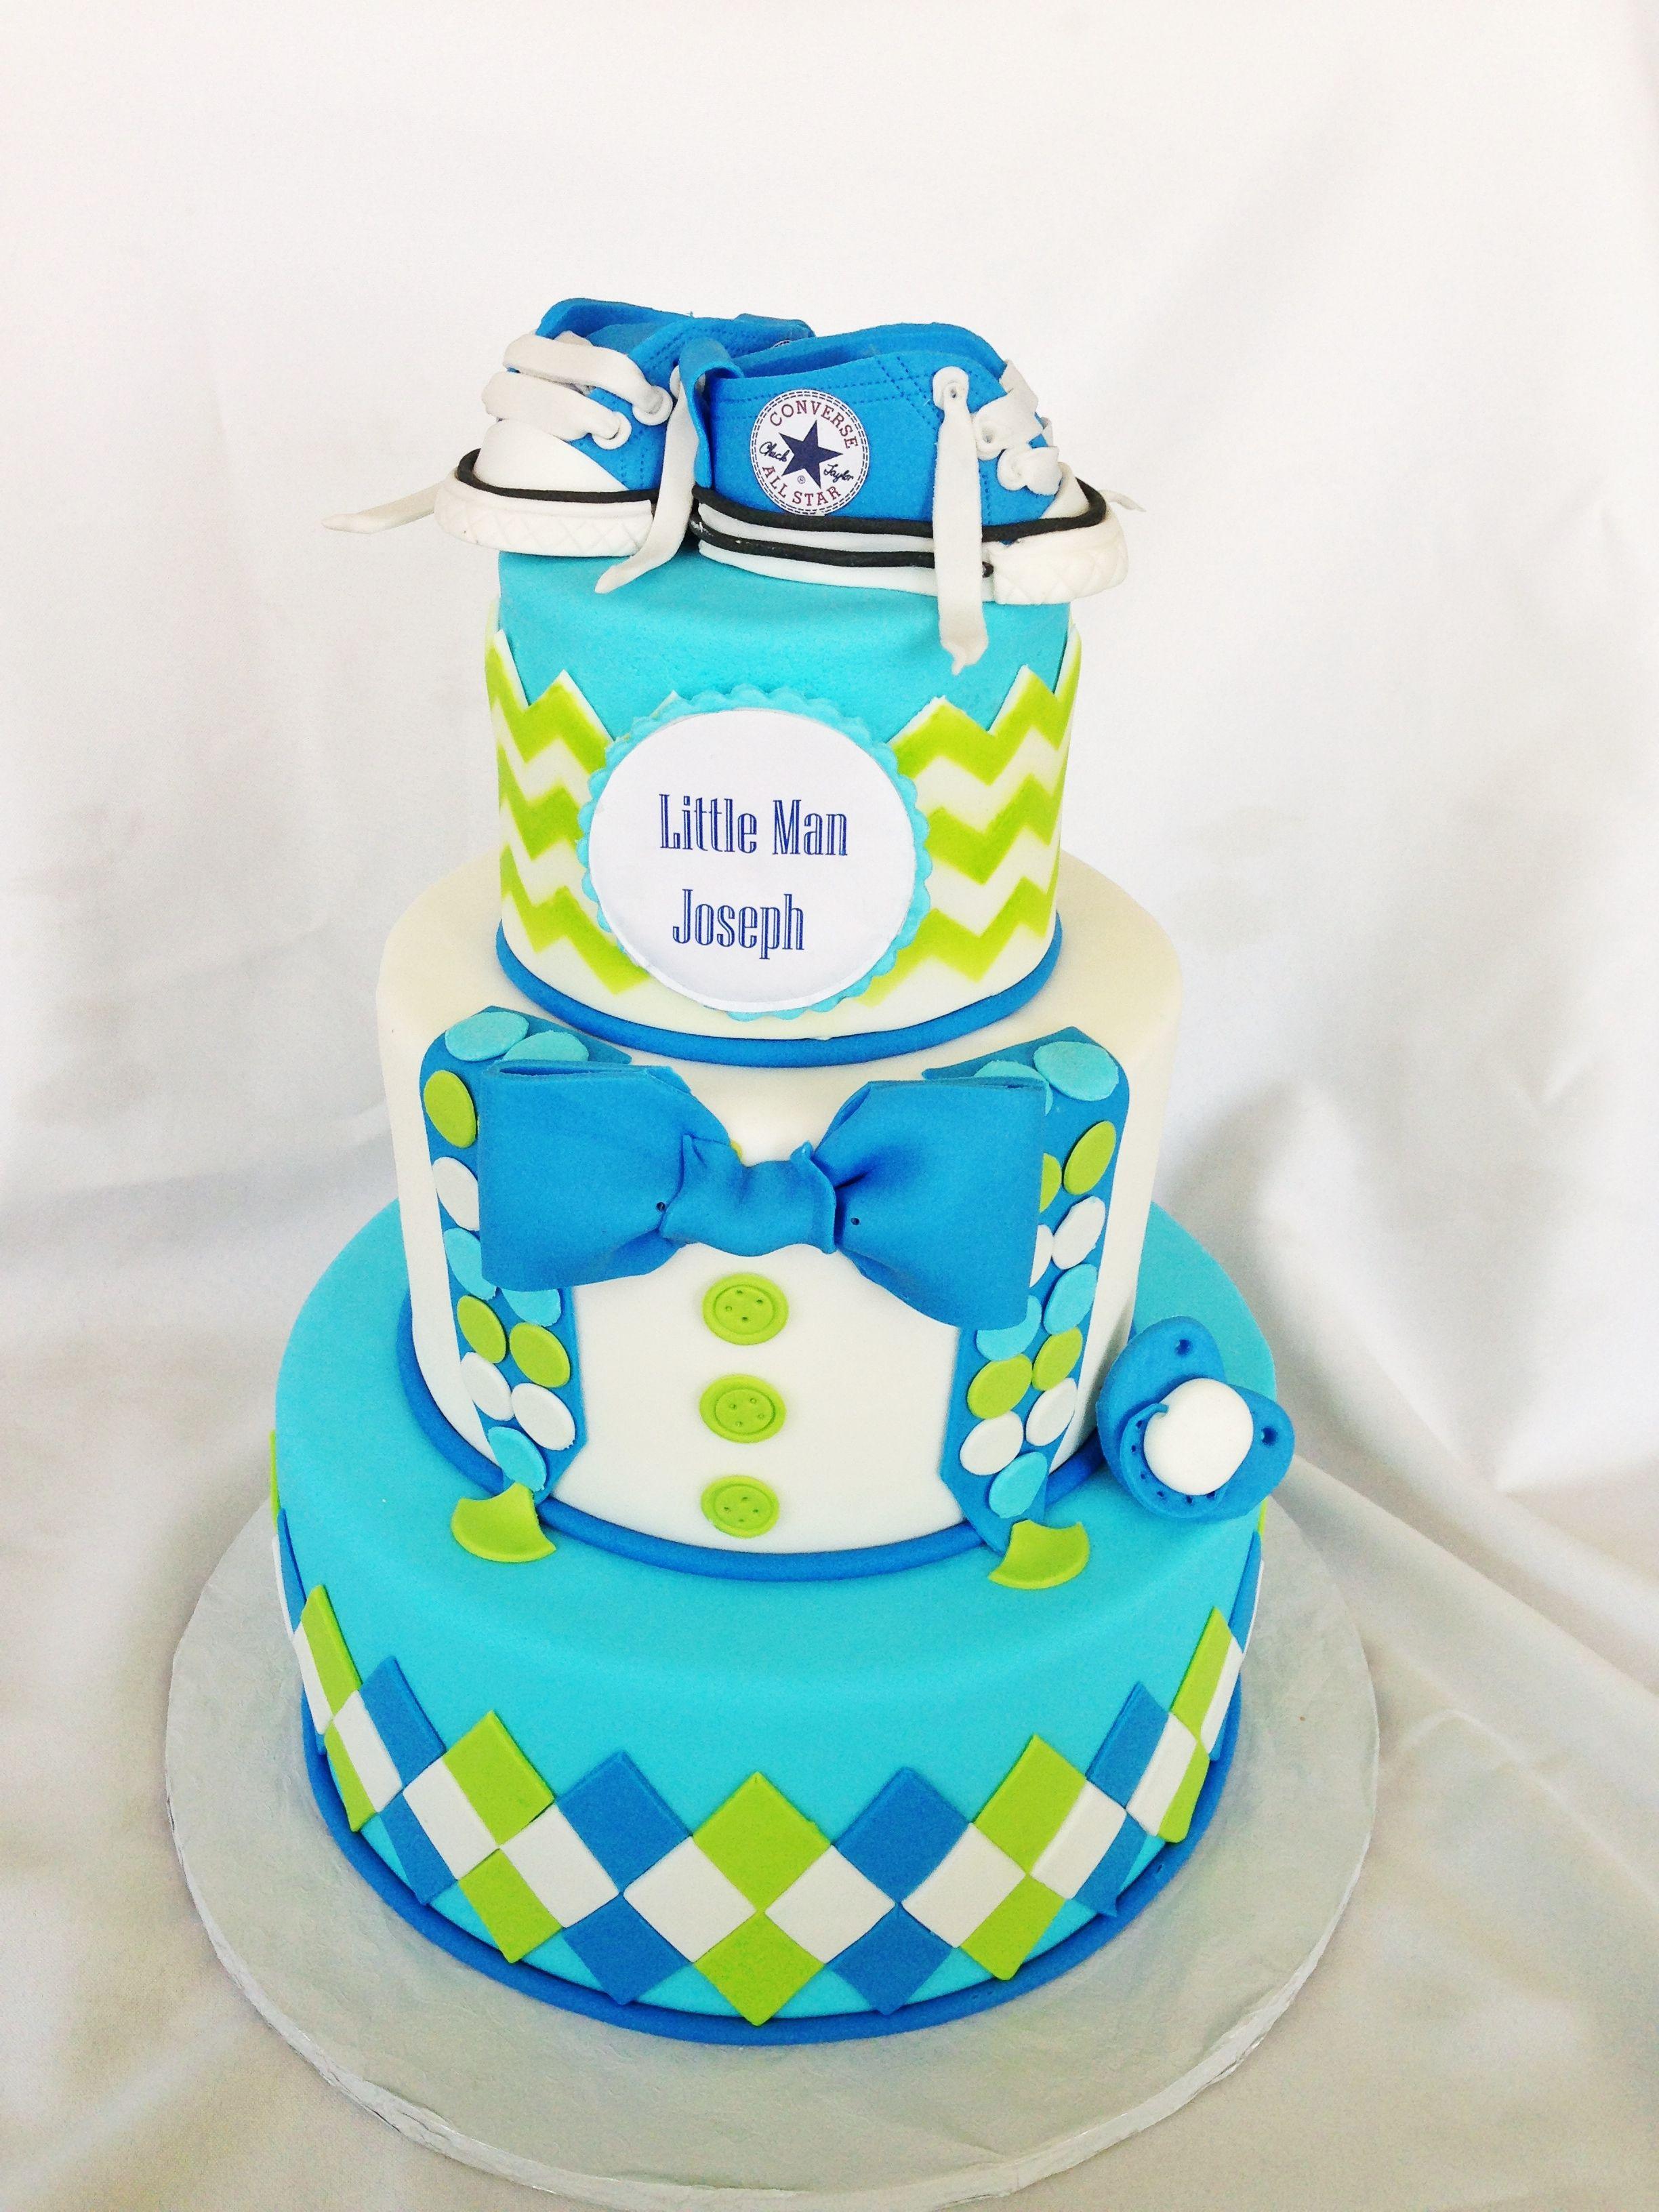 Little man 1st birthday cake Cakes Cupcakes Cake Pops